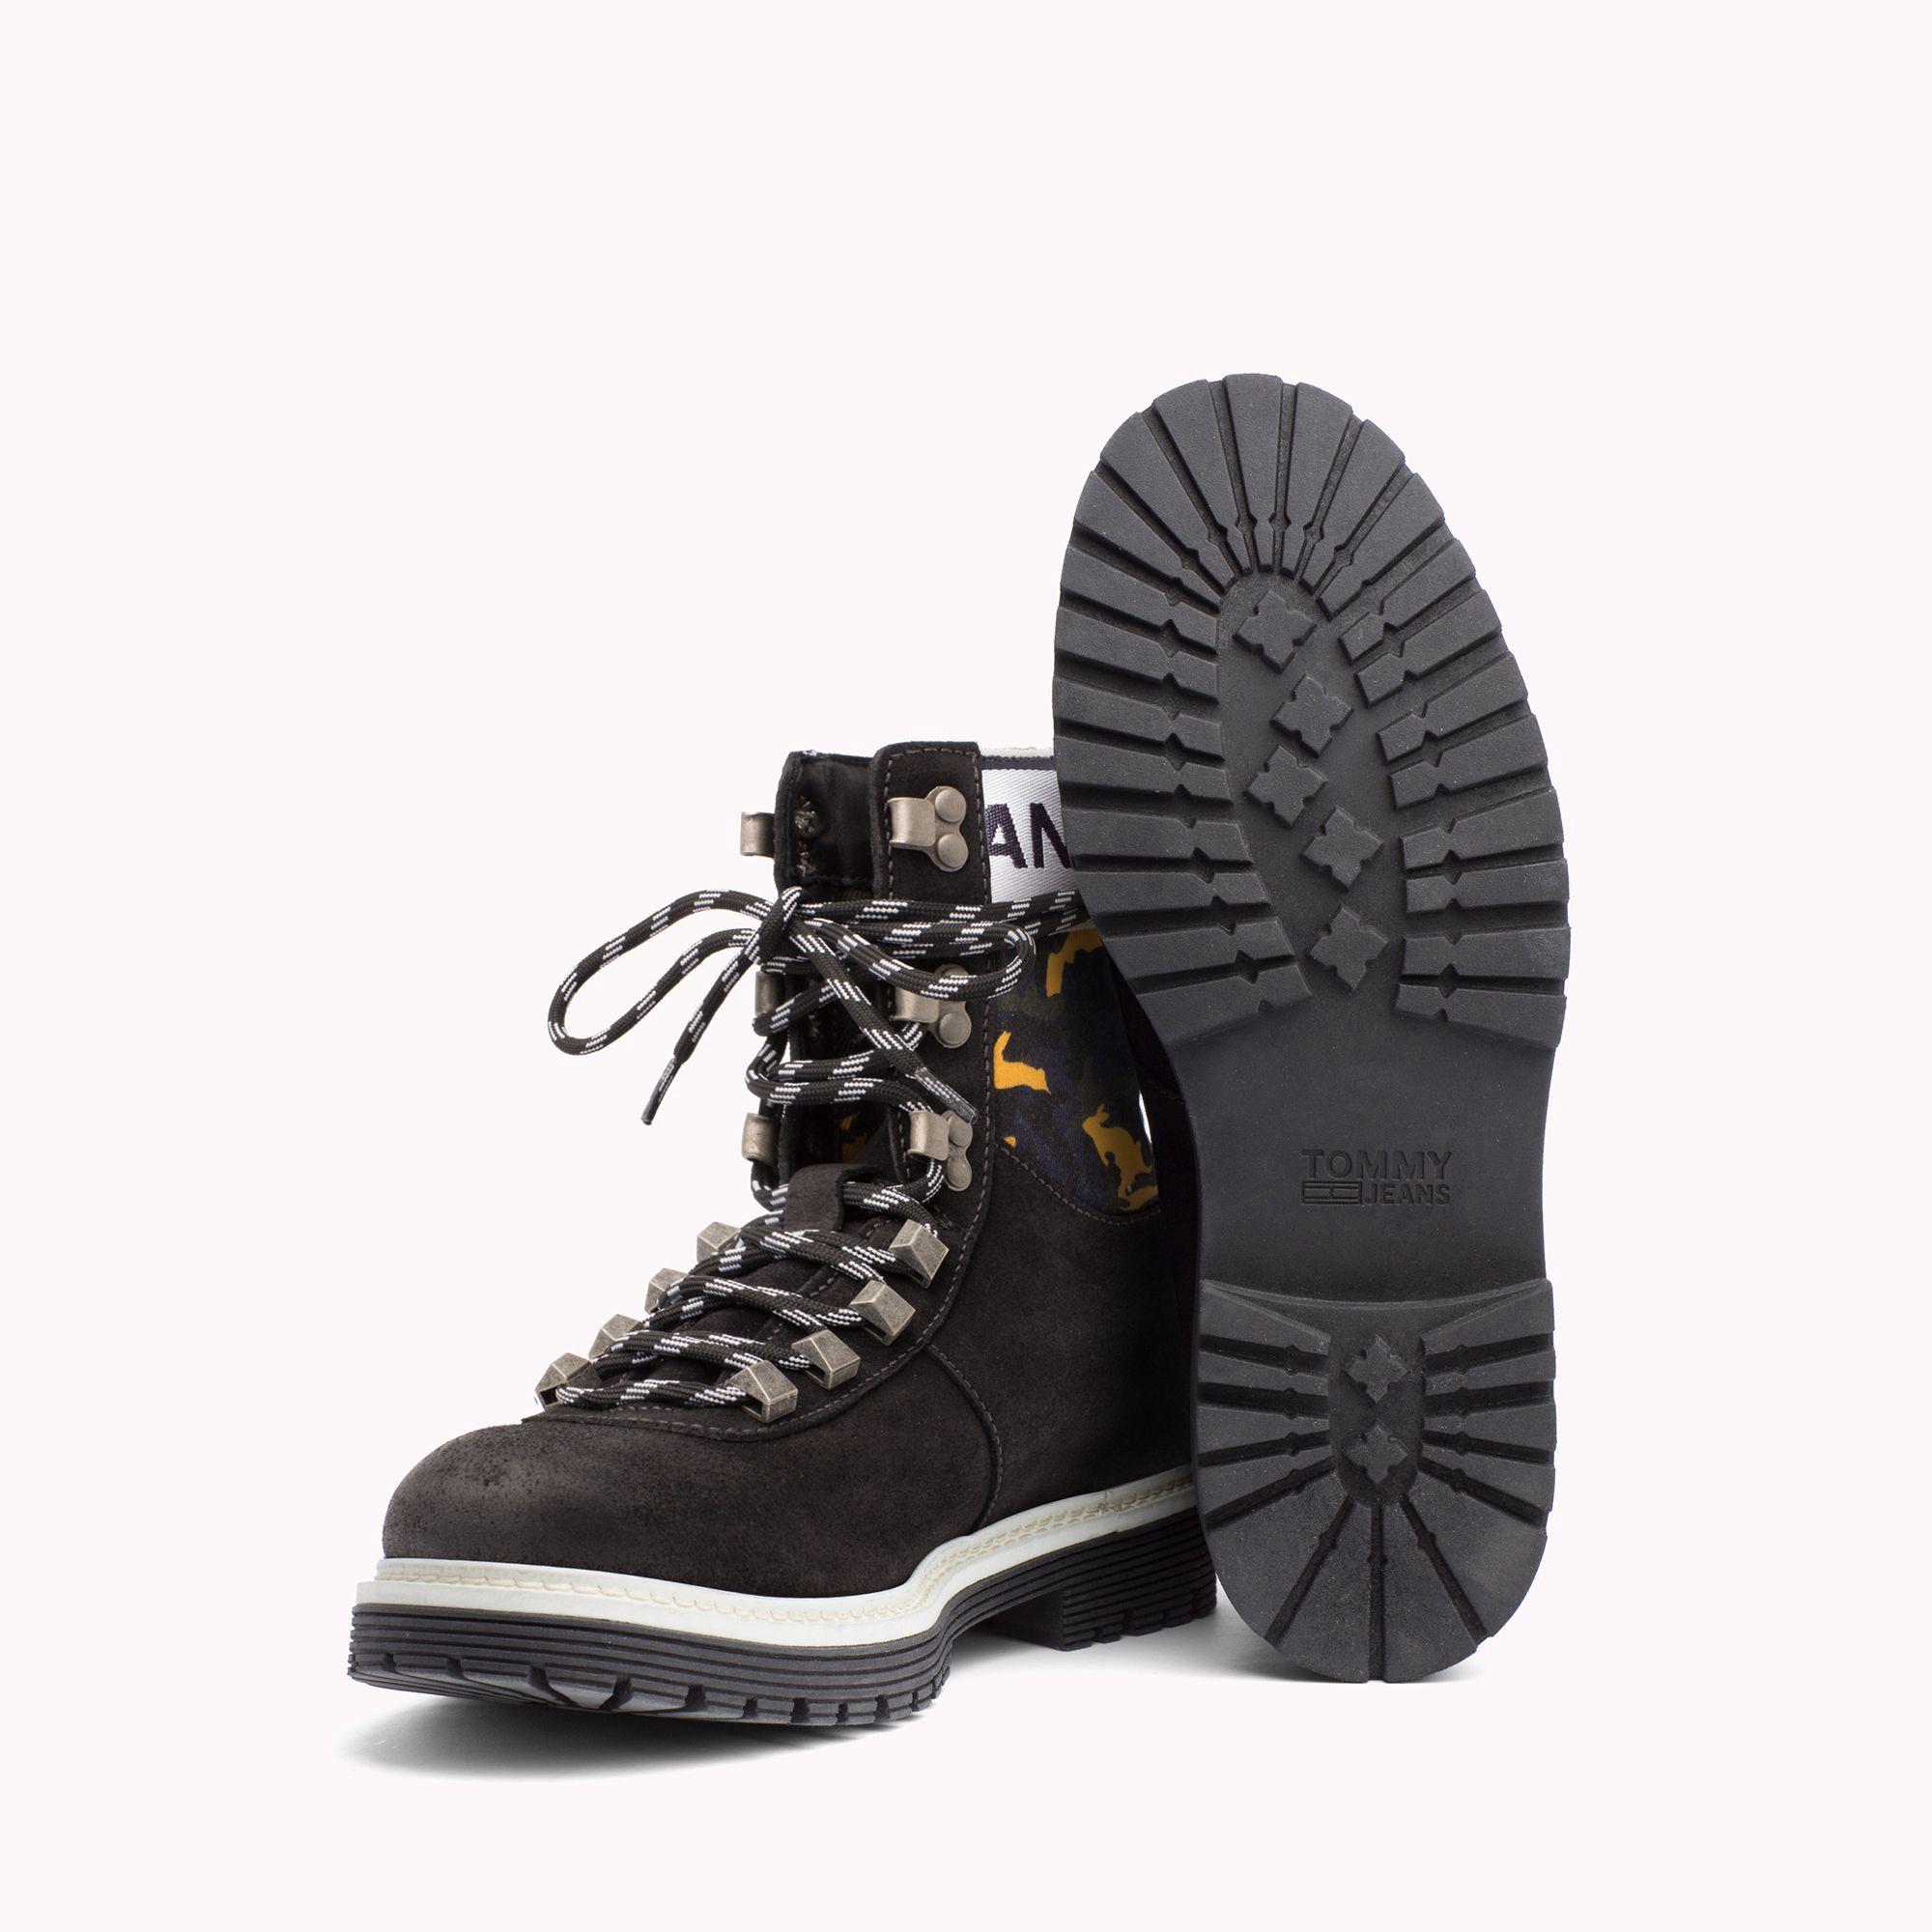 0b1d7cdd35672 Tommy Hilfiger Jeans Rabbit Camo Hiking Boot - 11.5